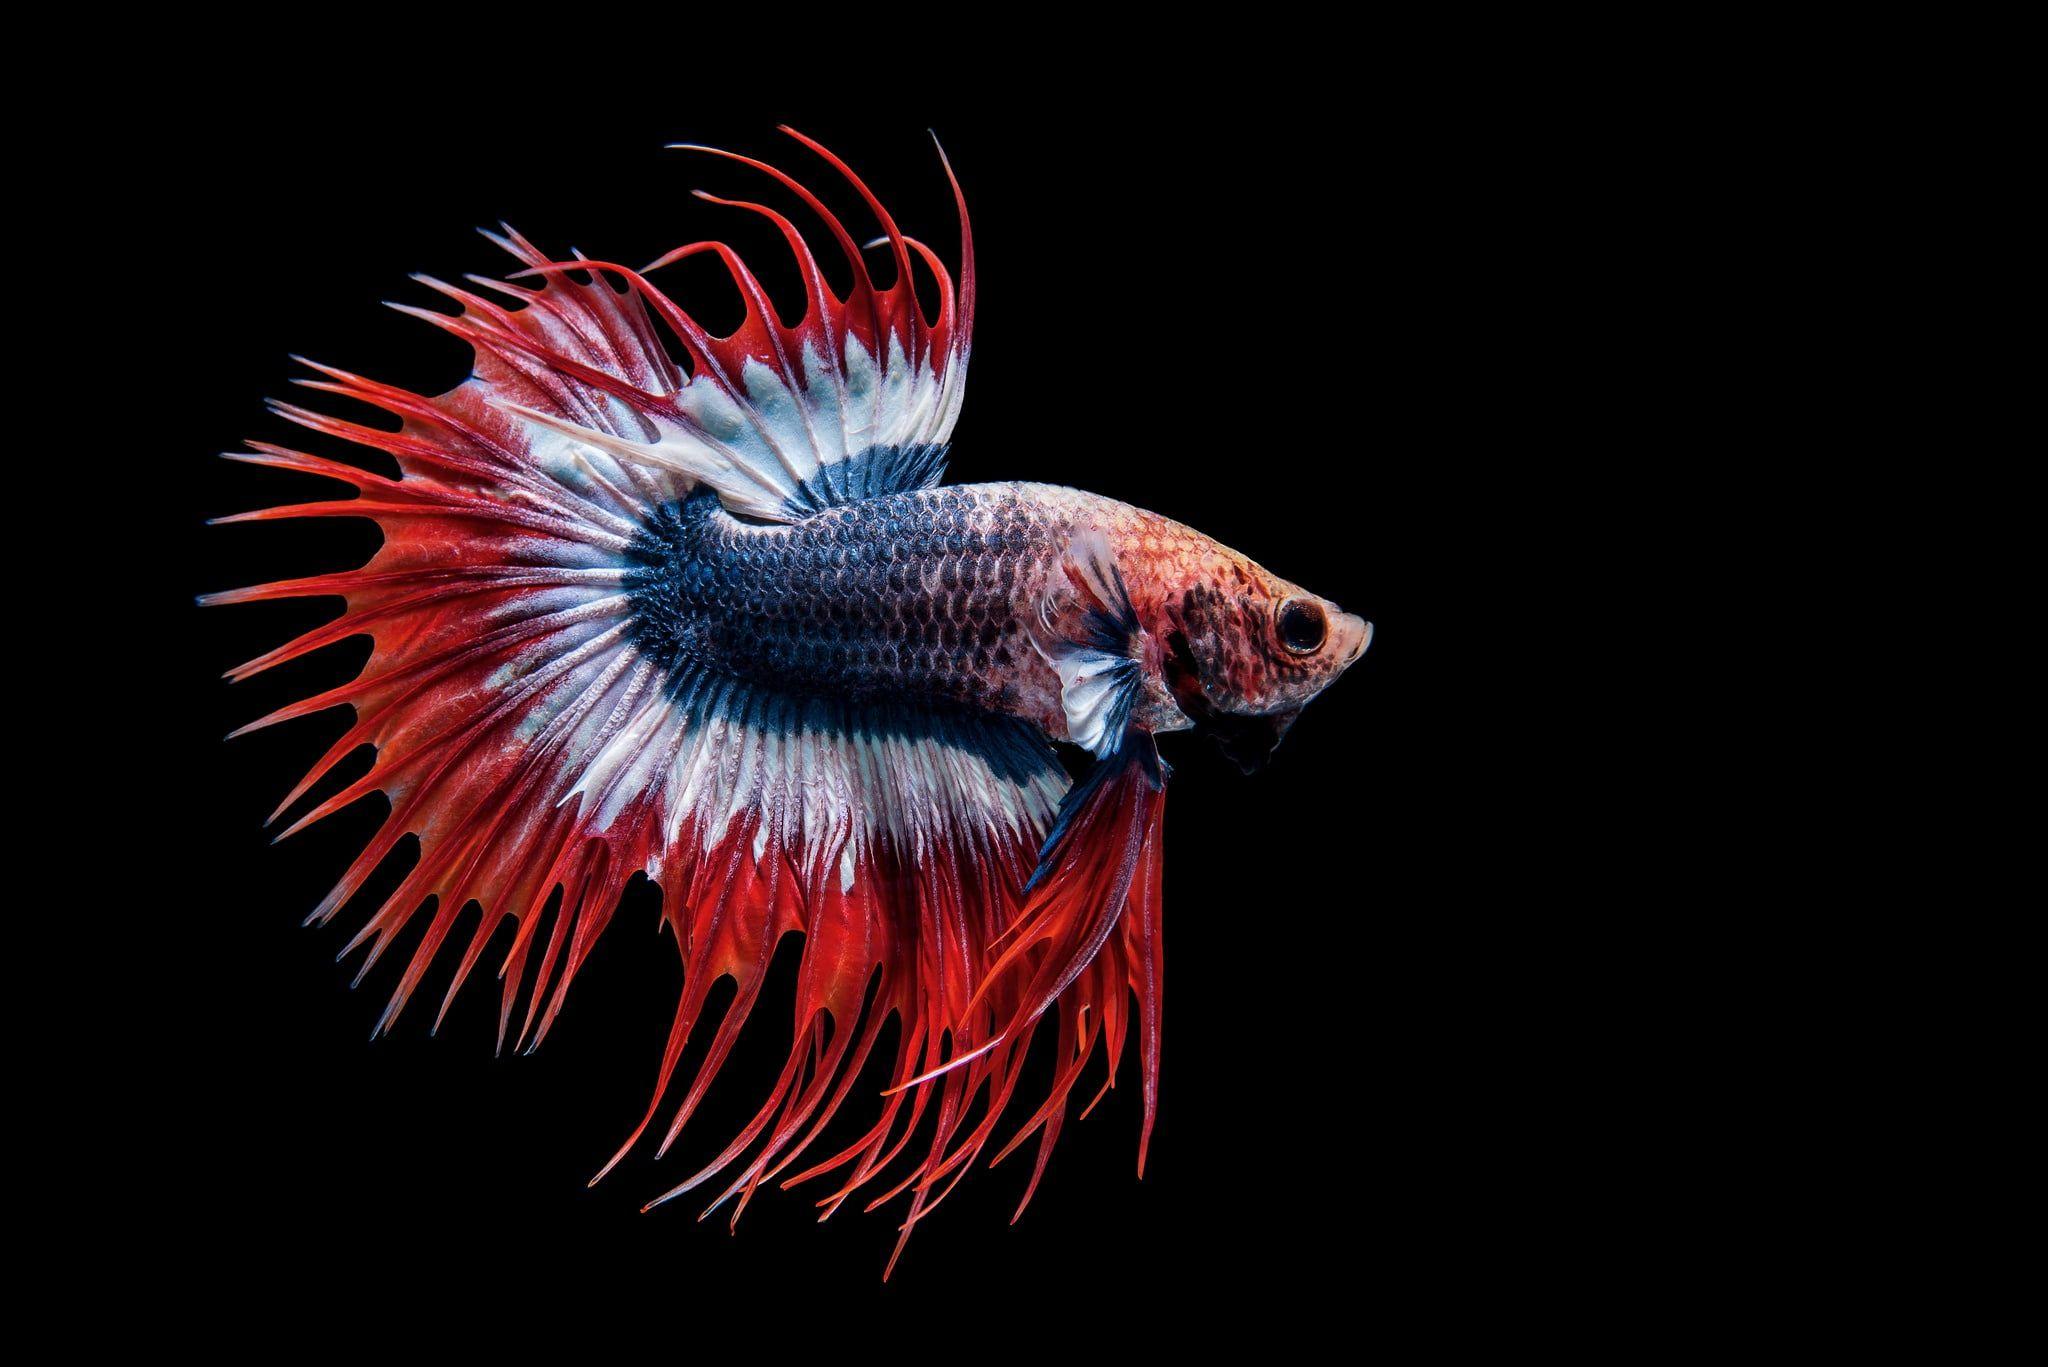 Animal Betta Fish 1080p Wallpaper Hdwallpaper Desktop In 2020 Fish Wallpaper Betta Beautiful Fish